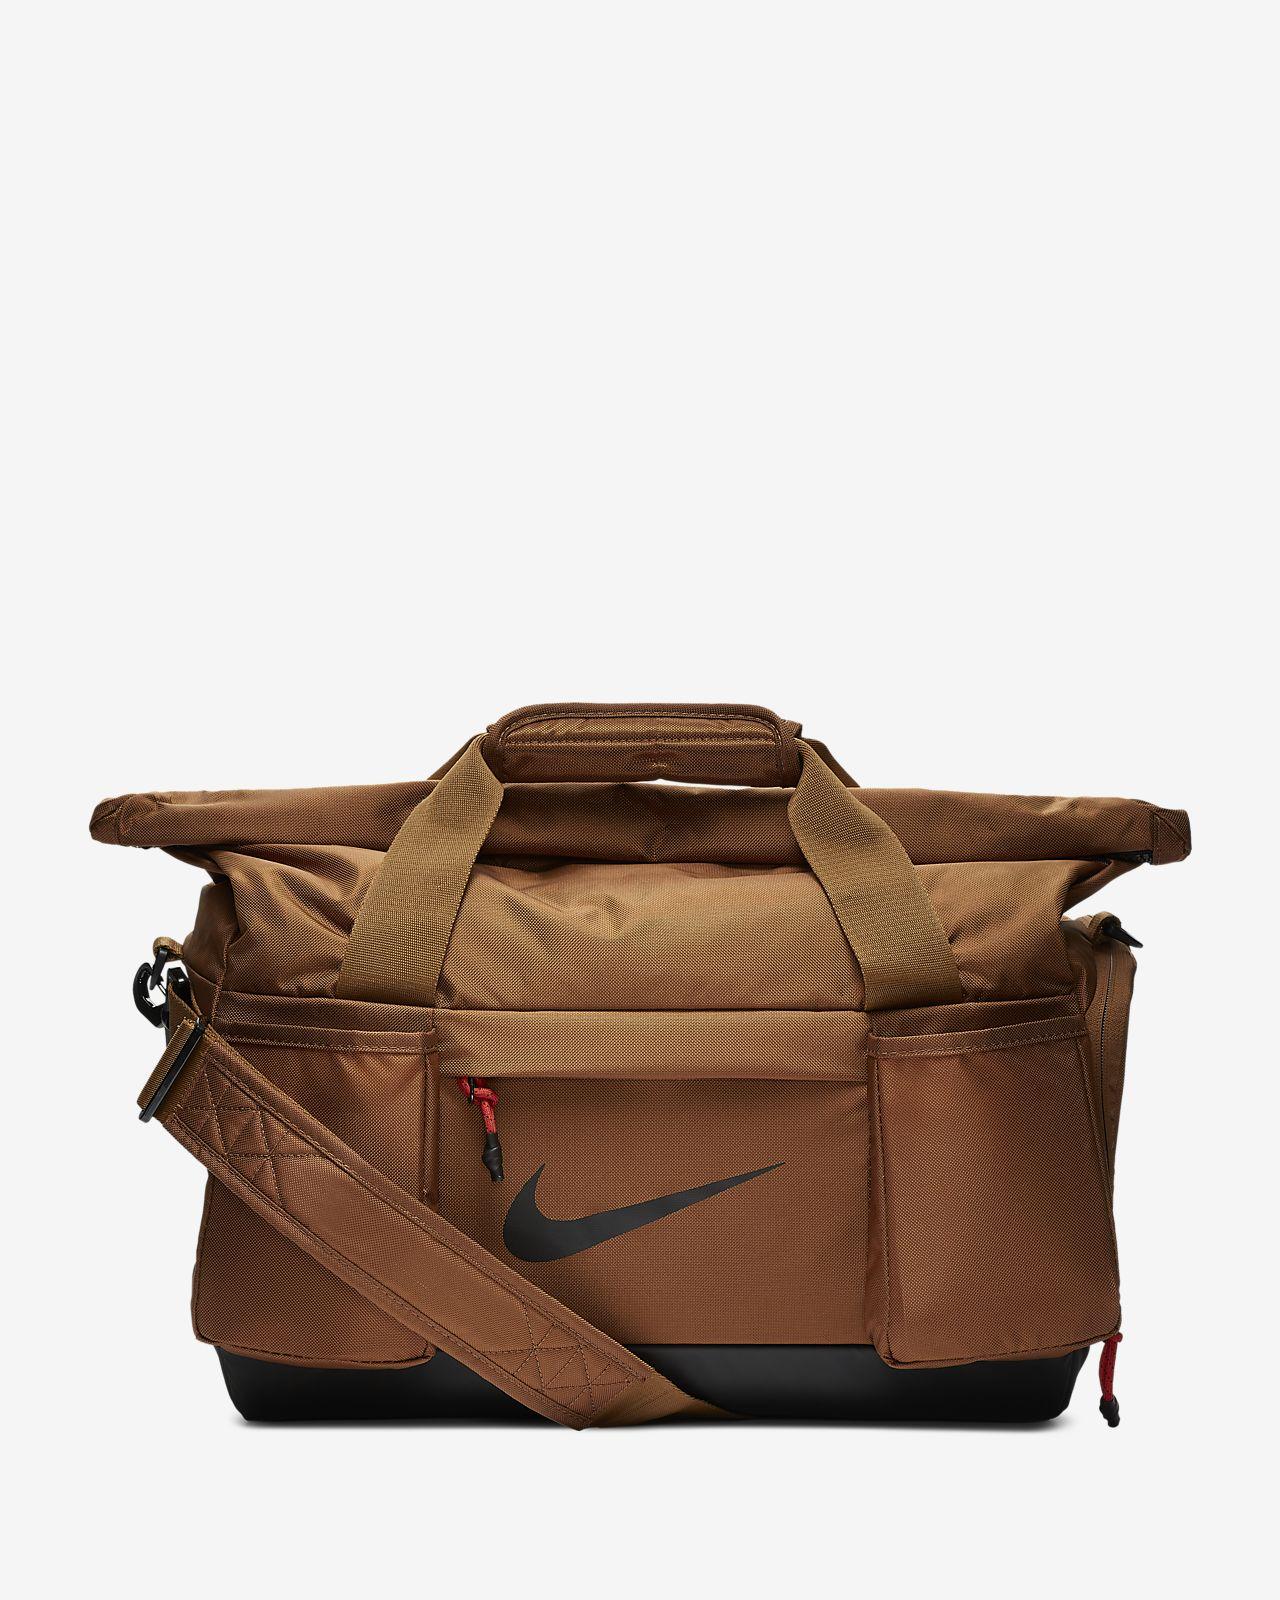 Nike Vapor Speed训练行李包